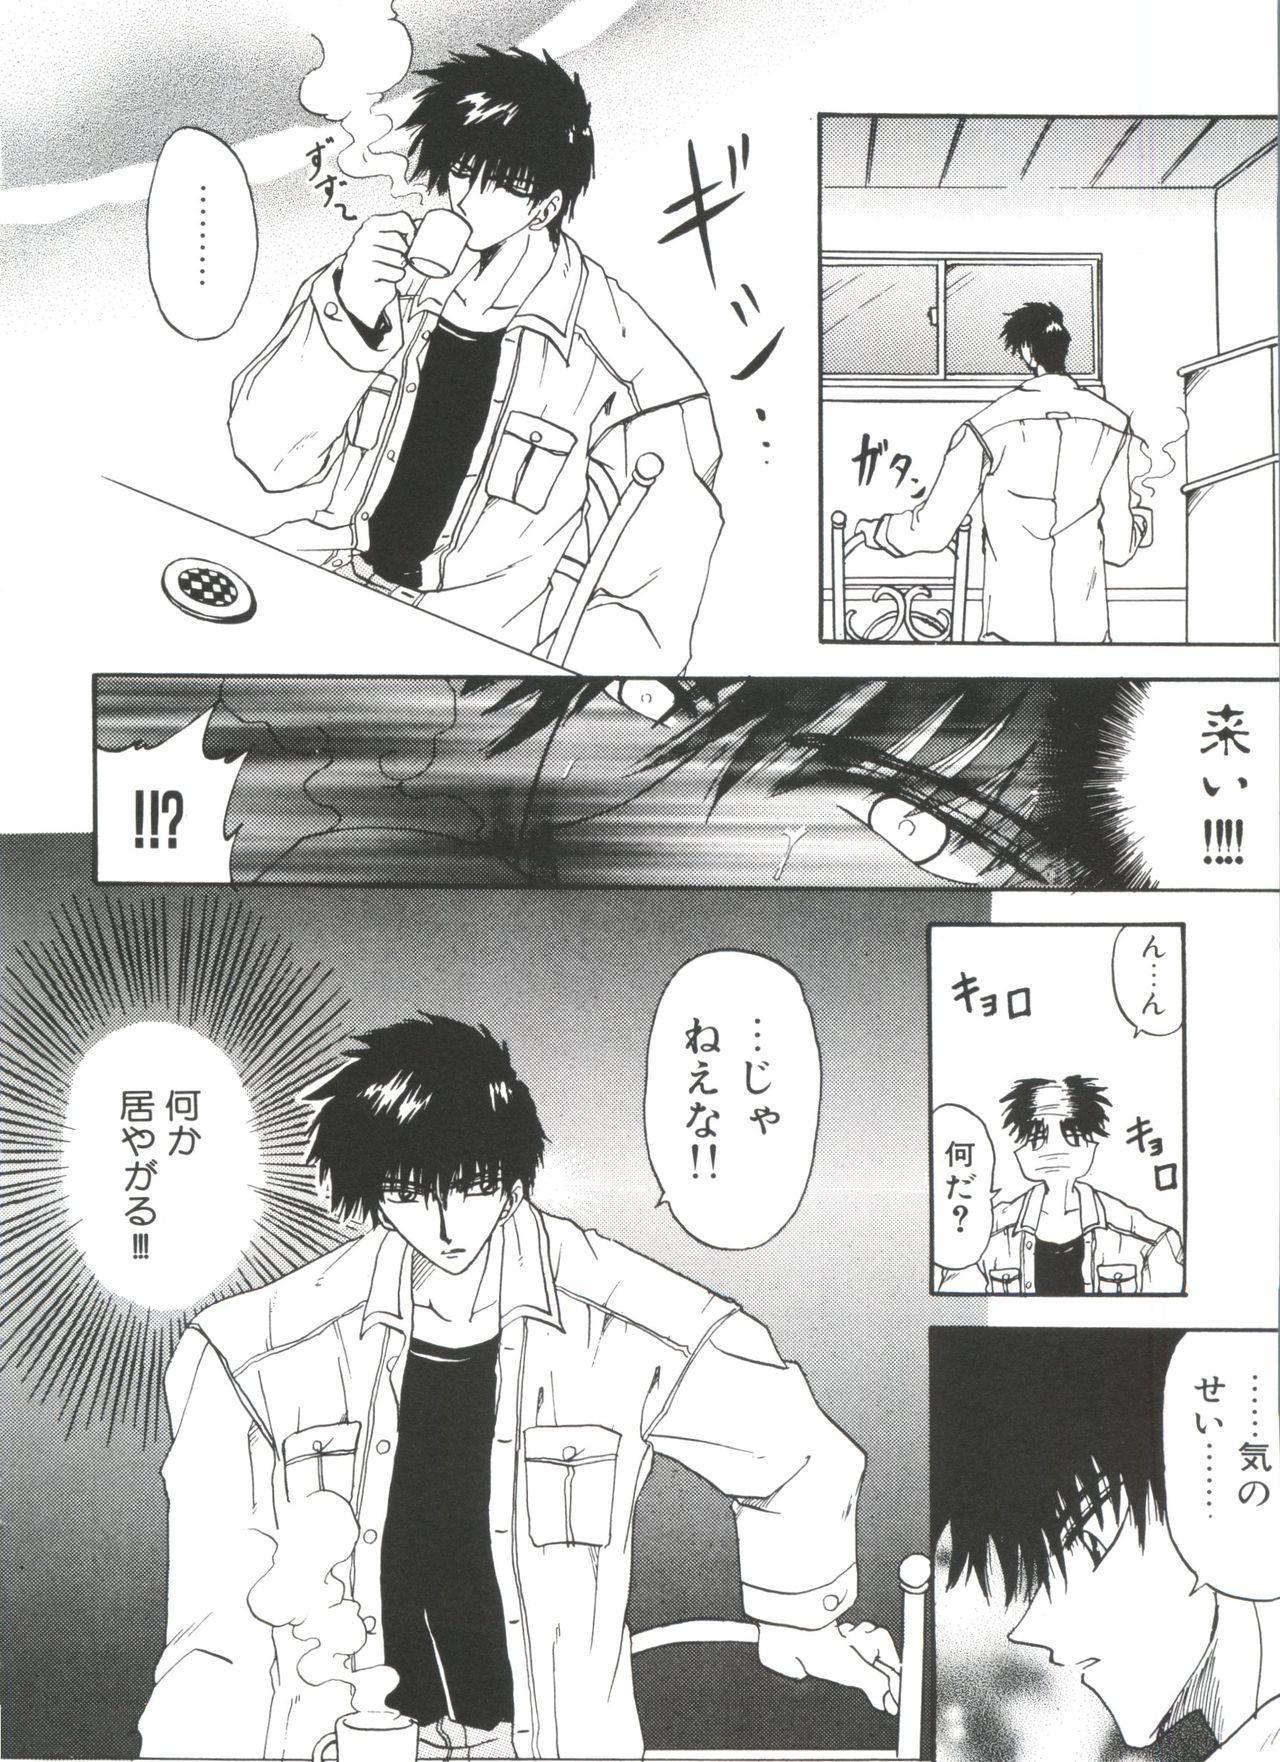 Ero-chan to Issho 2 97